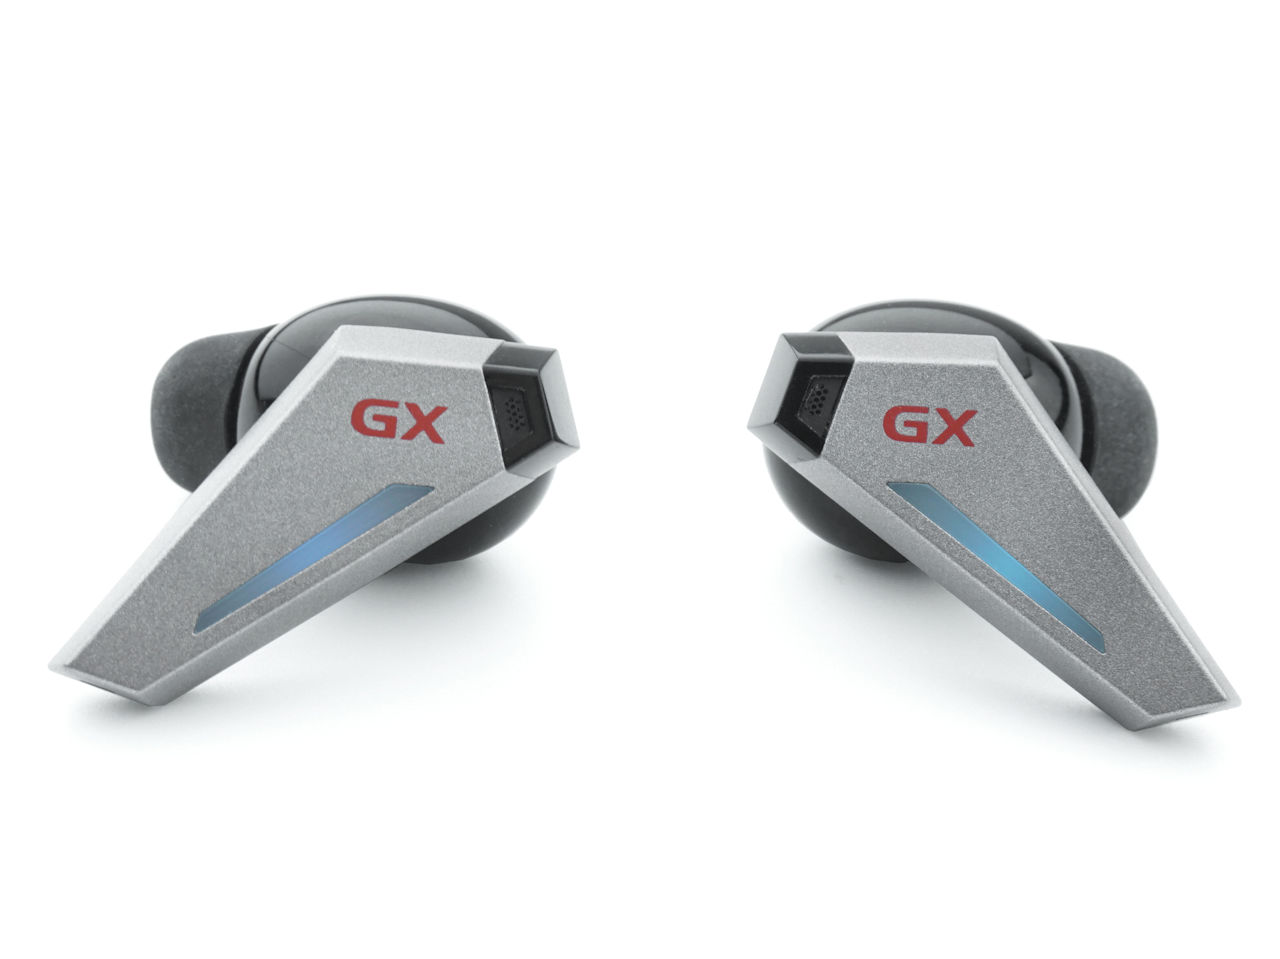 Edifier HECATE GX07